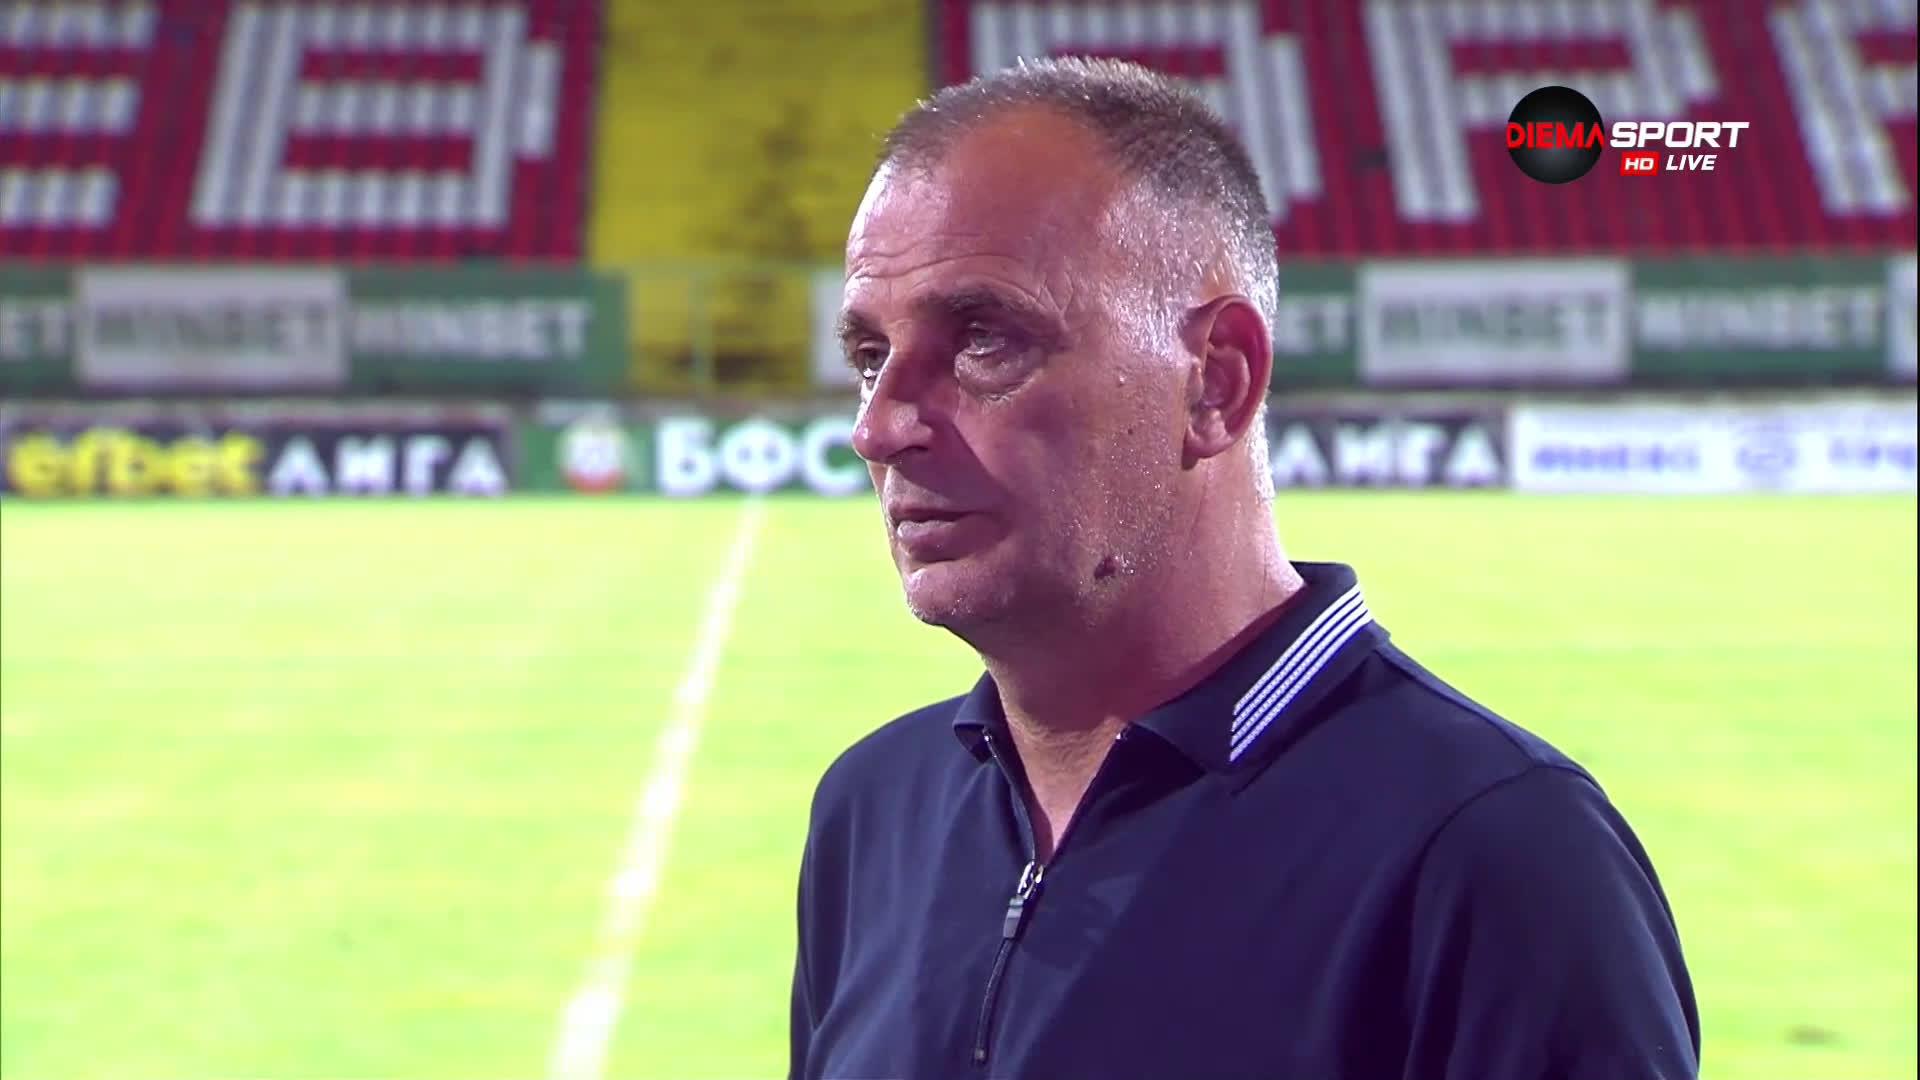 Антони Здравков: Не знам защо играем така